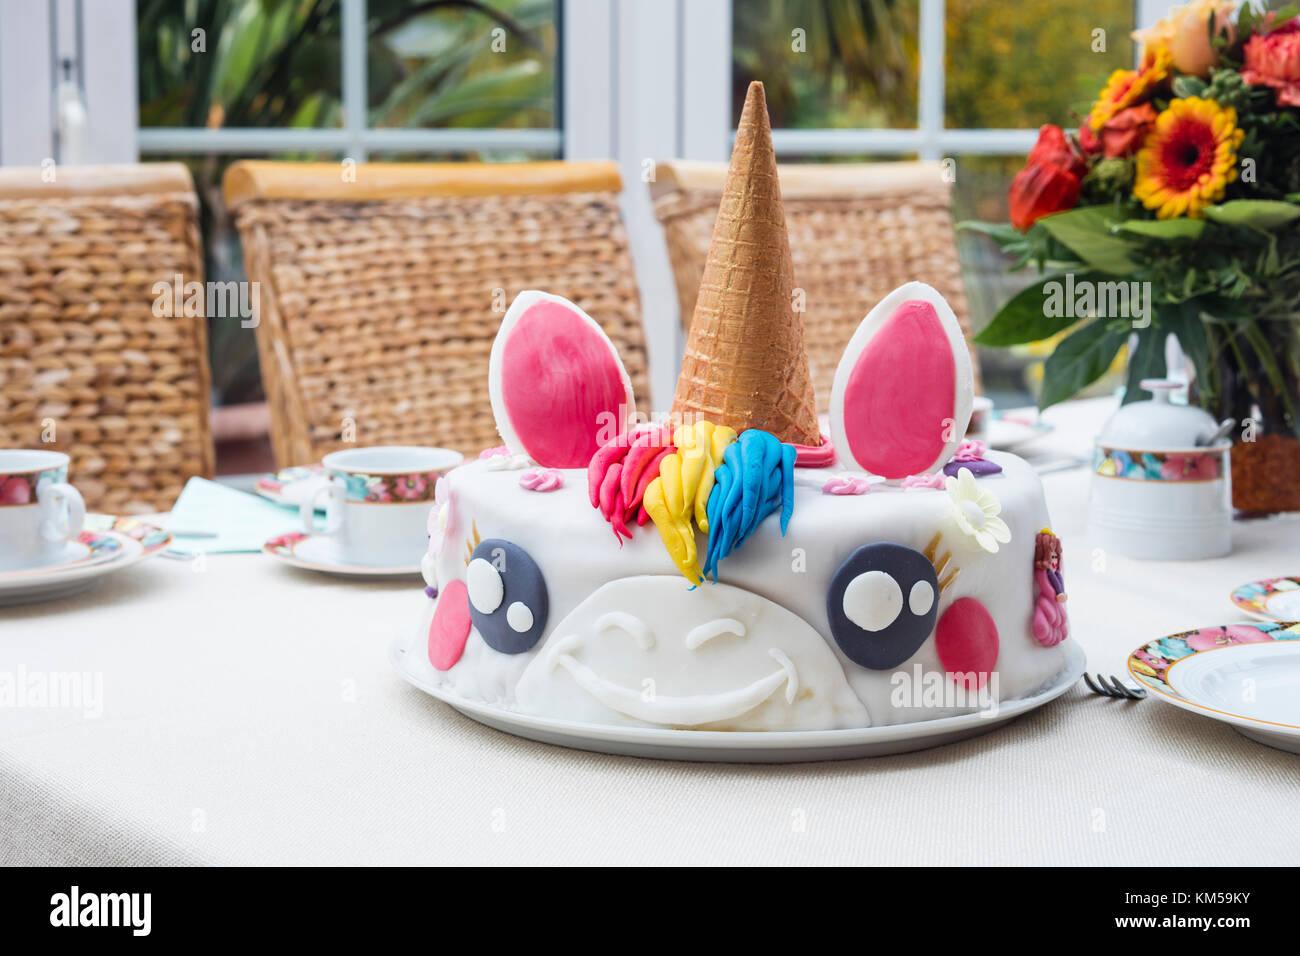 Homemade Birthday Cake Unicorn On A Table